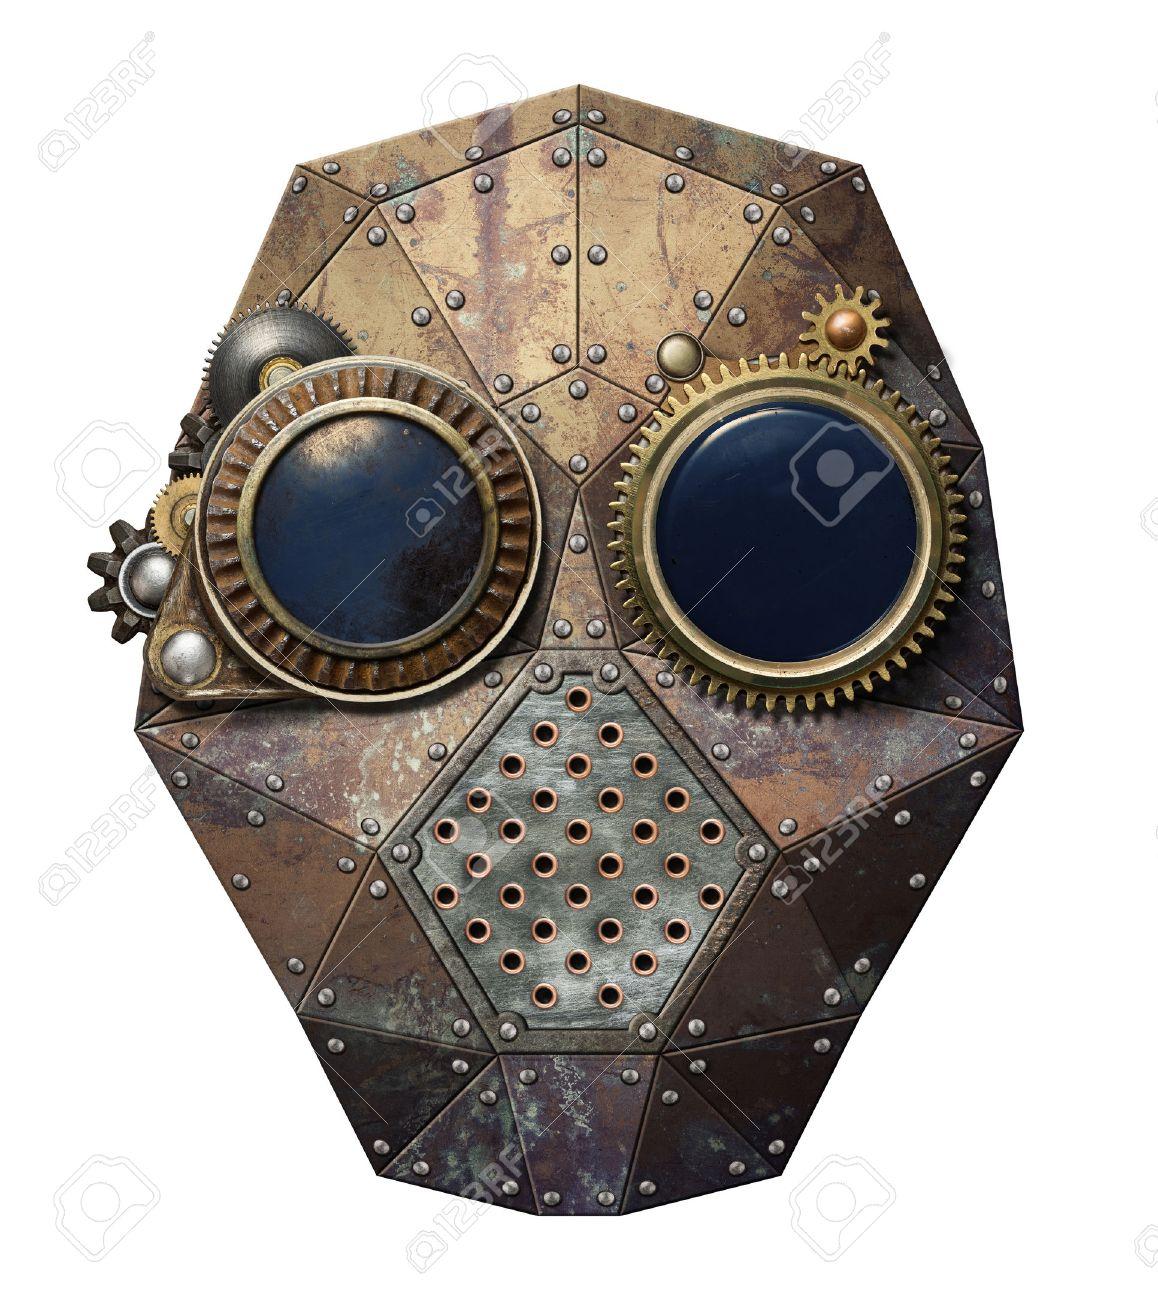 Steampunk metal robot head. Stock Photo - 33207977